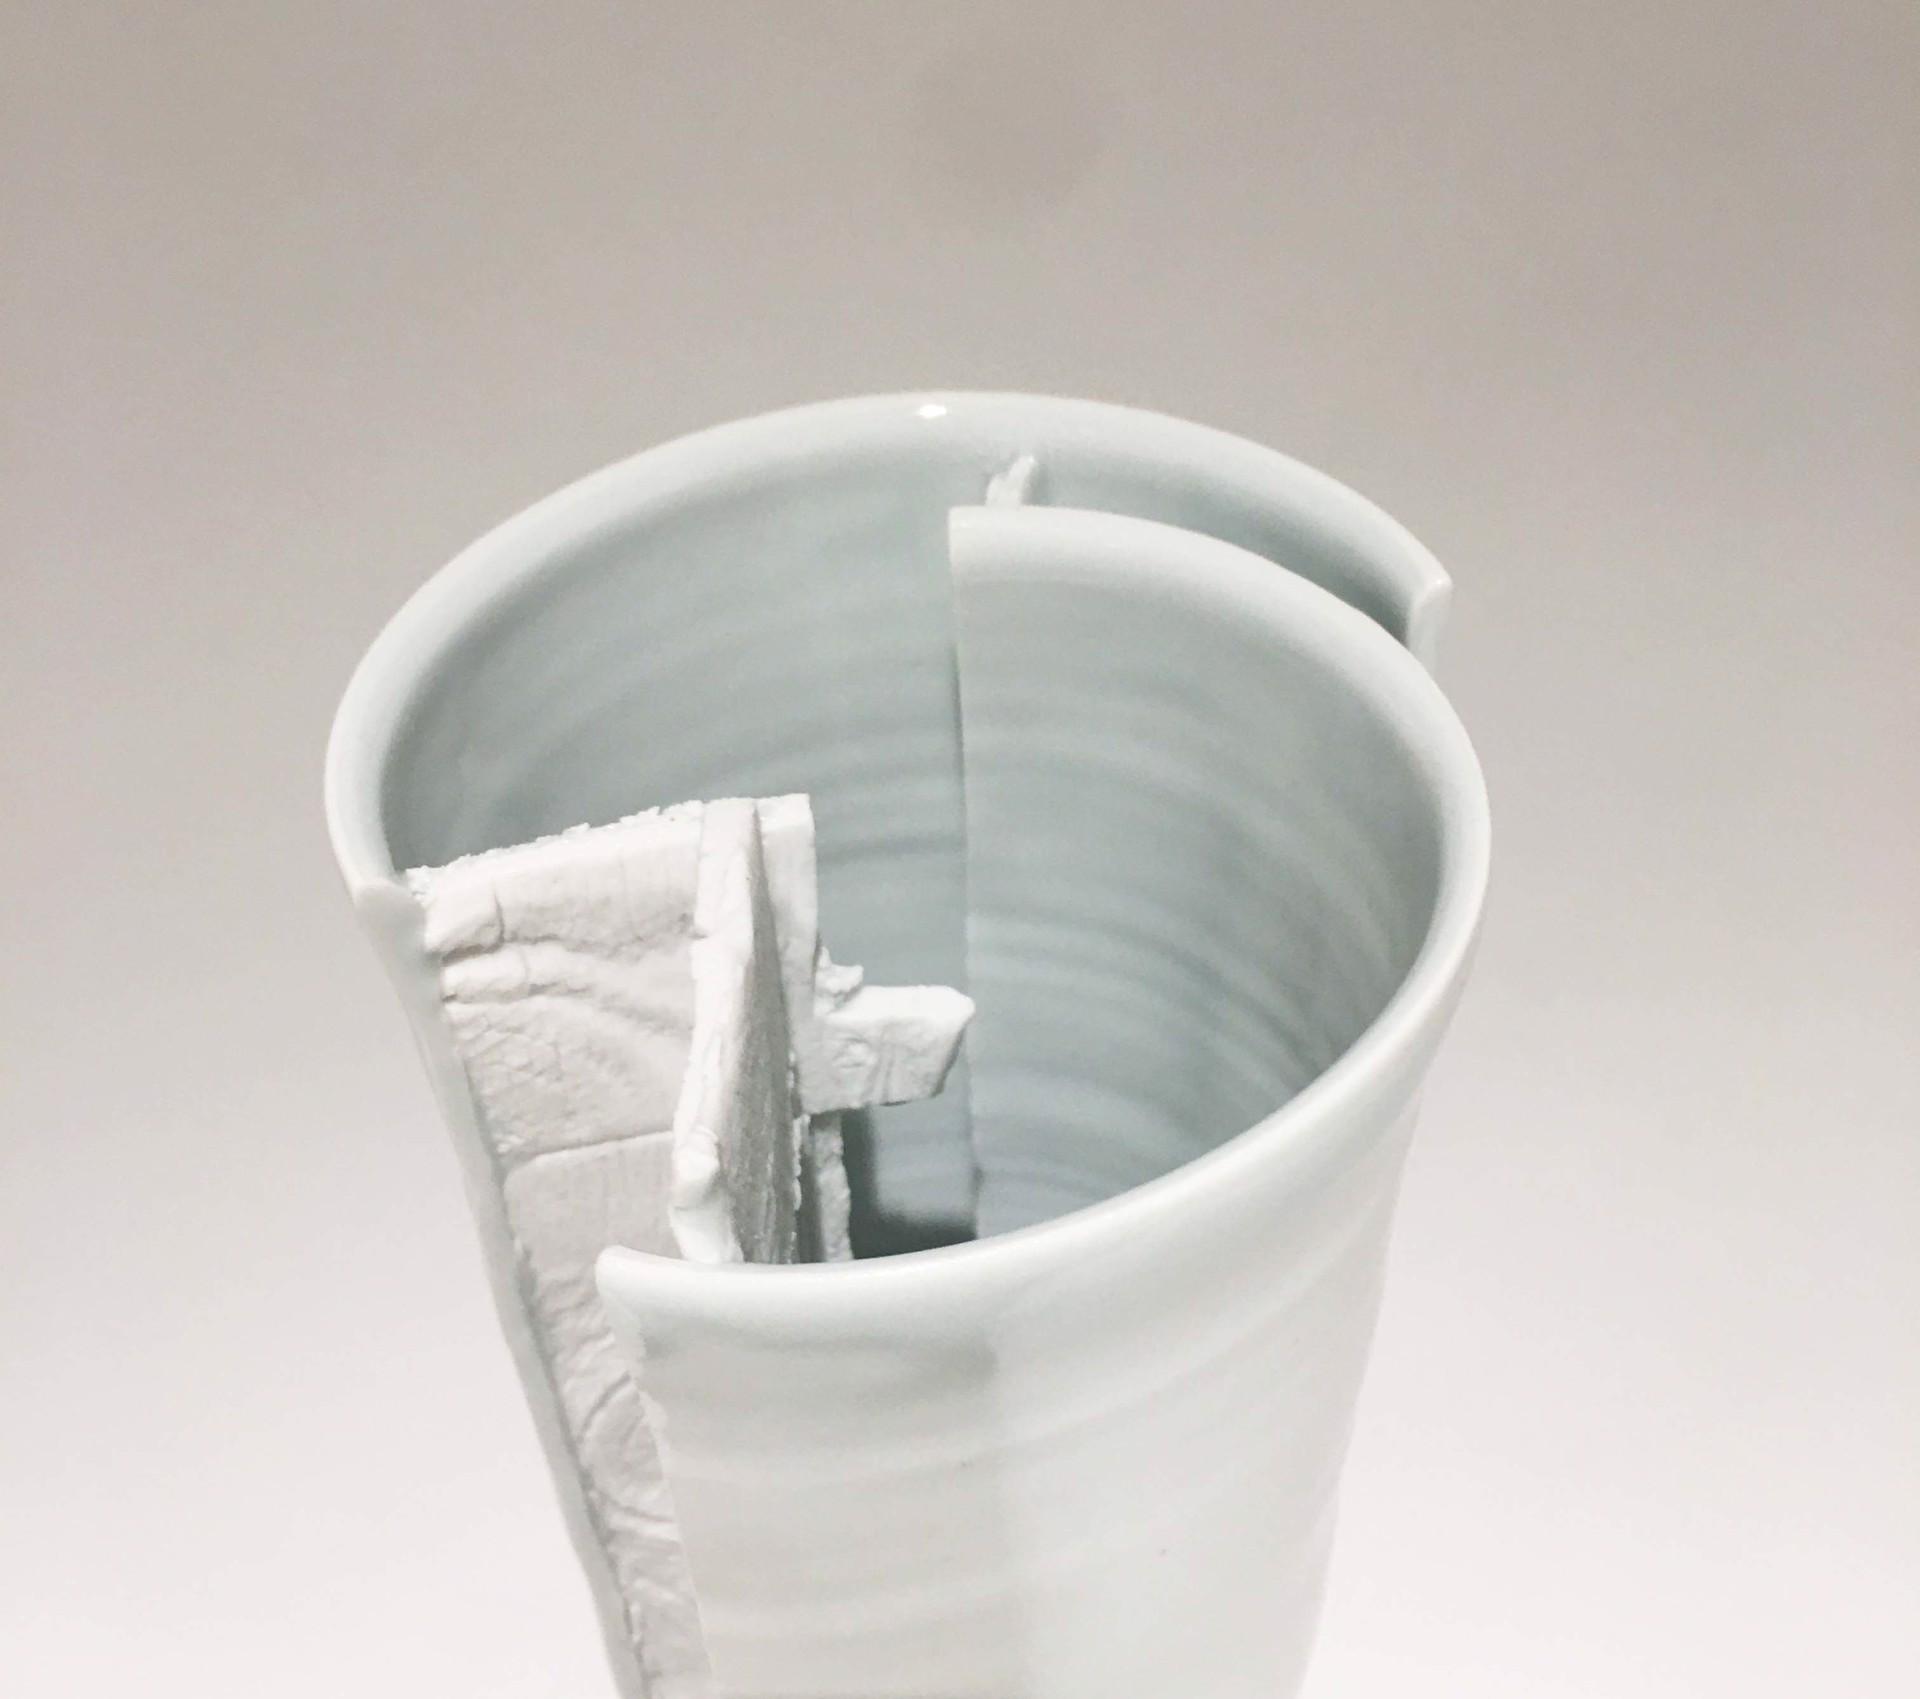 Vase 4 (bottomless) by Bryan Hopkins